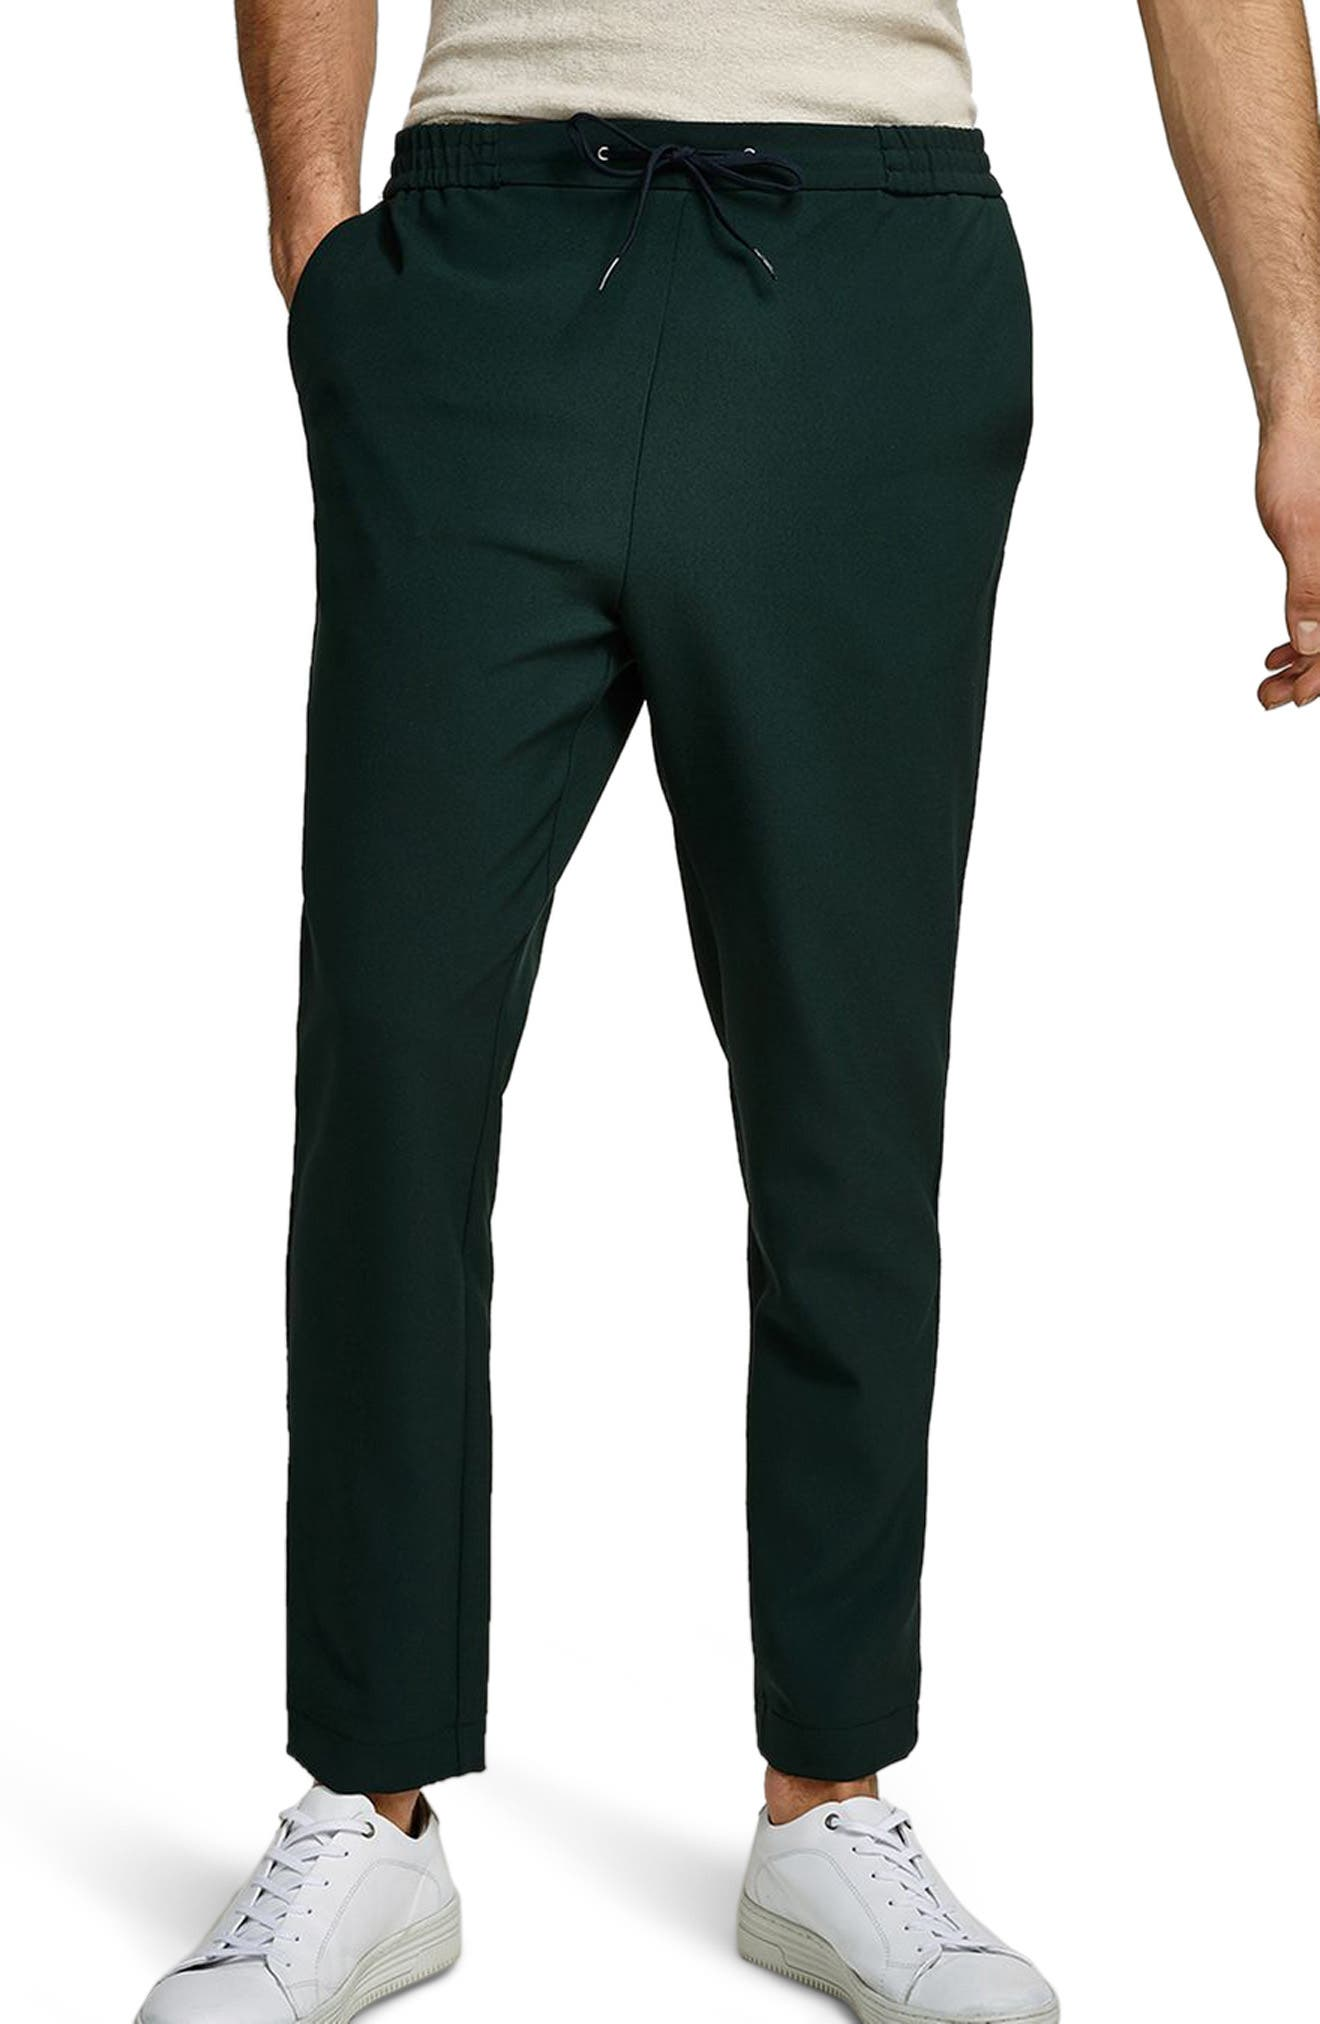 Topman Slim Cropped Track Pants